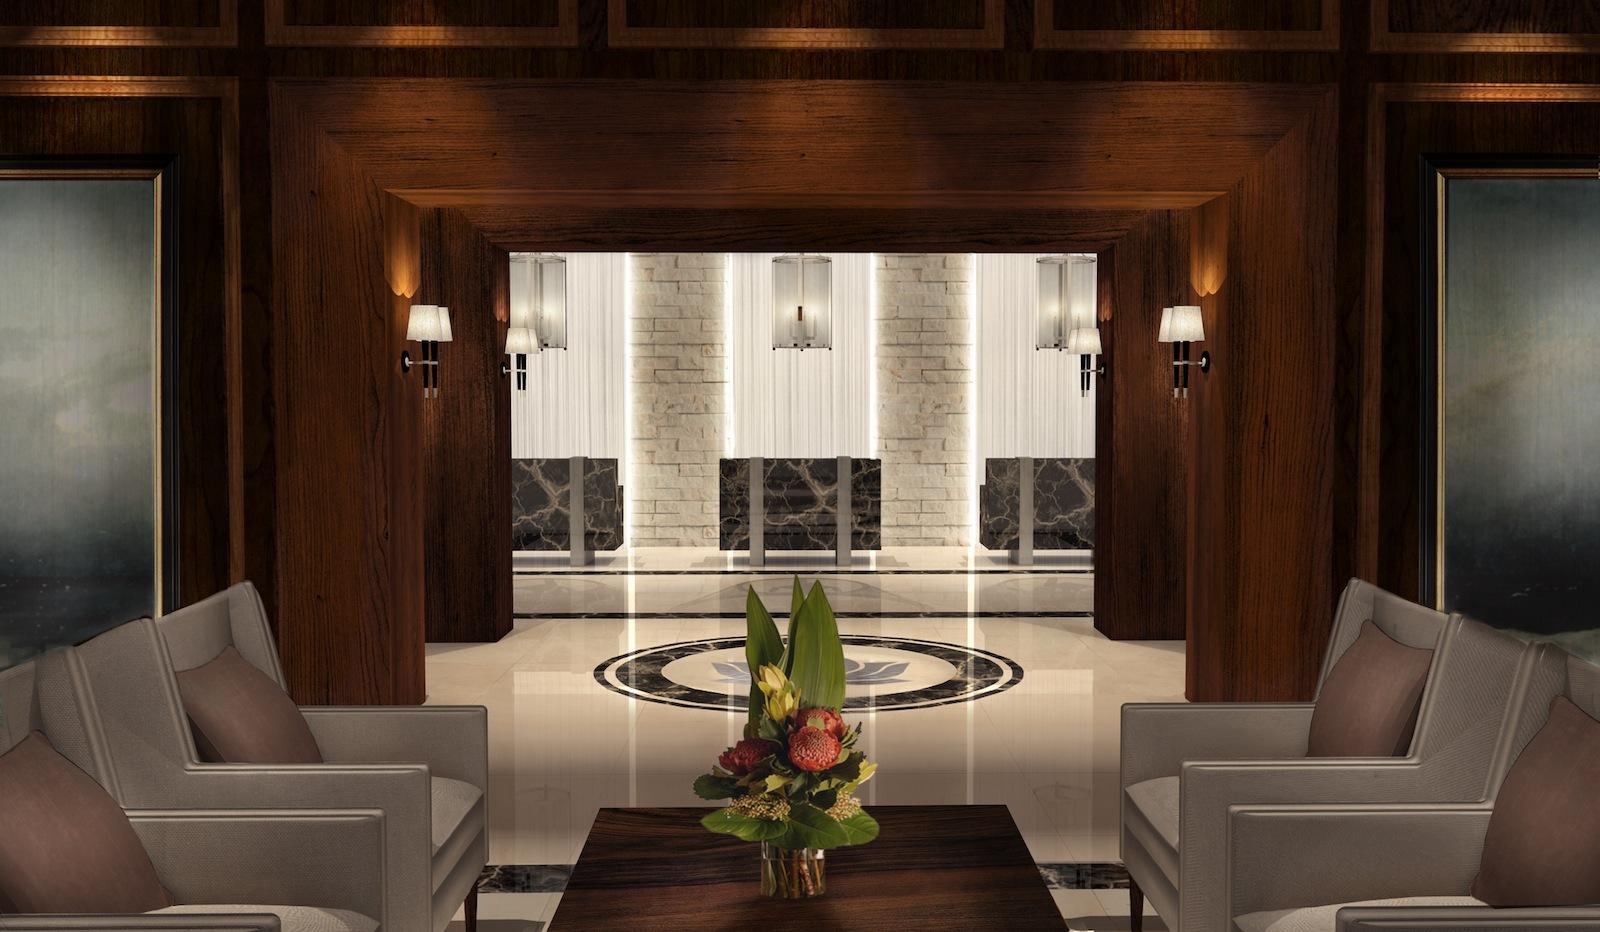 Luxury urban hotel concept designed by Angela Rodriguez Interiors